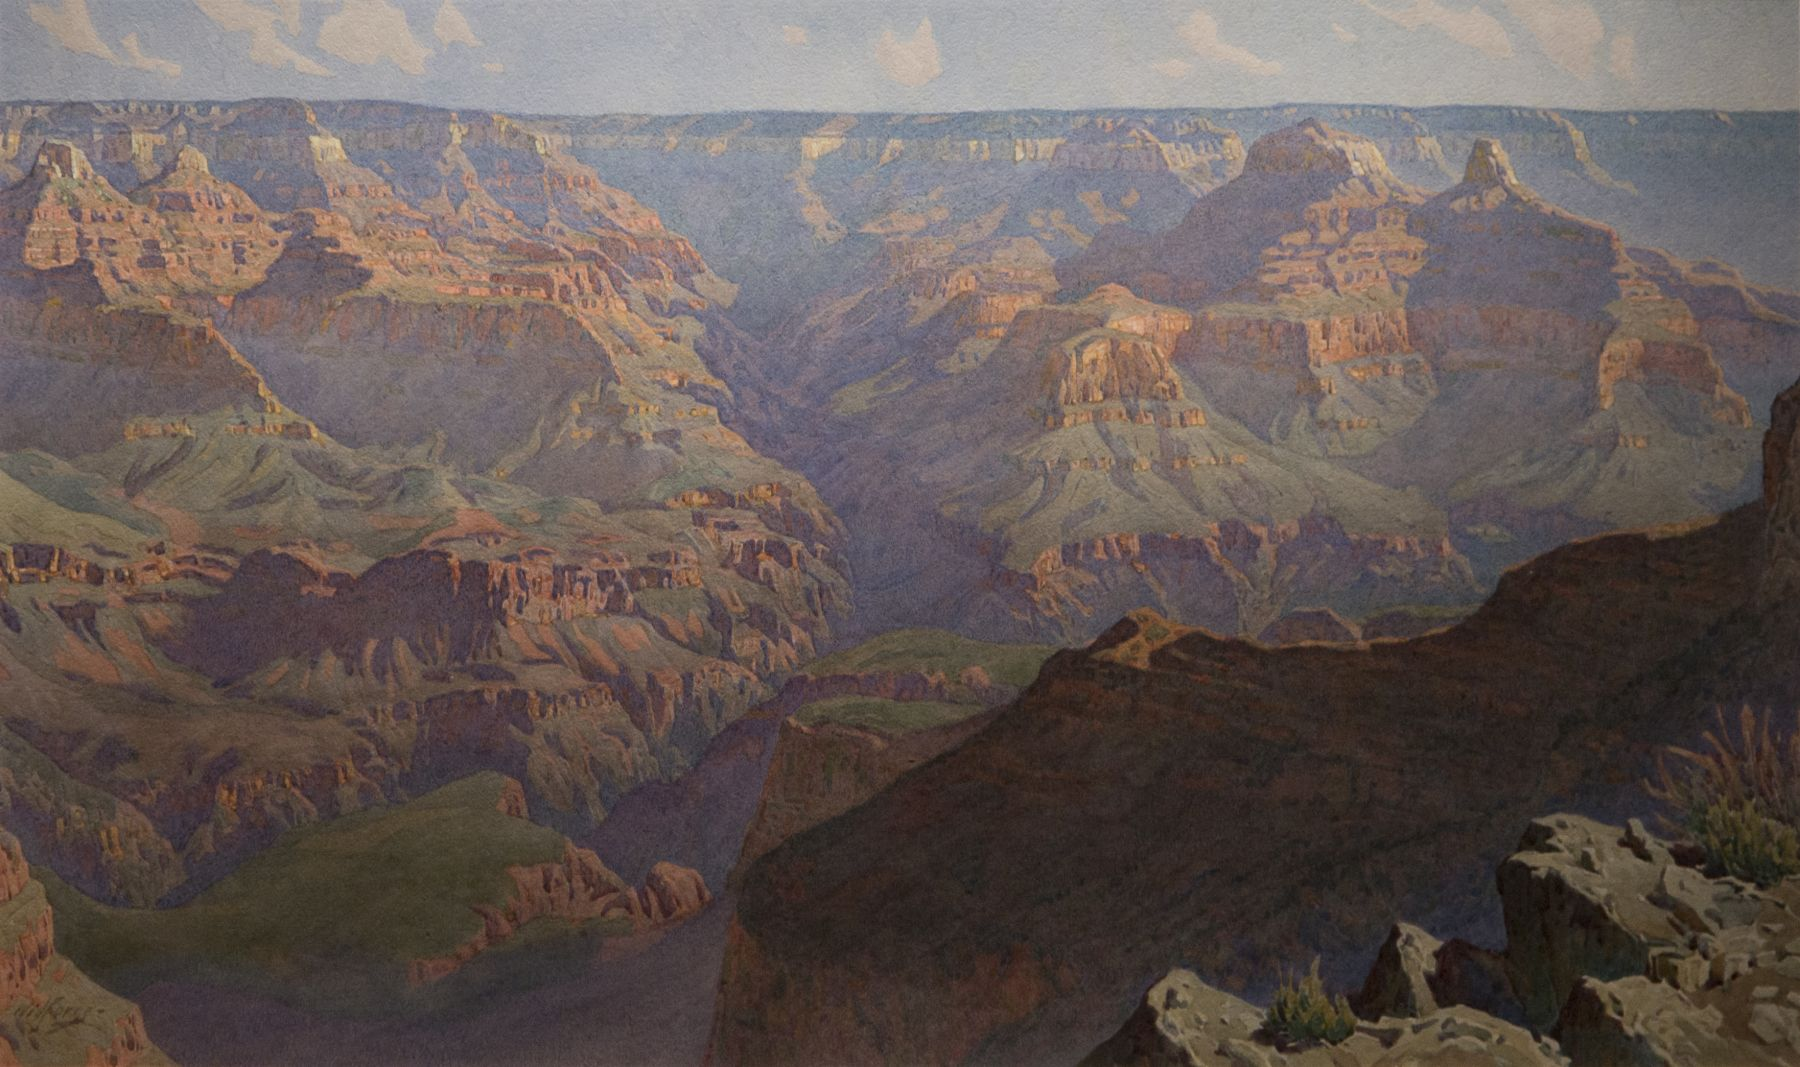 Gunnar Widforss, Grand Canyon, Grand Canyon National Park, western art, landscape